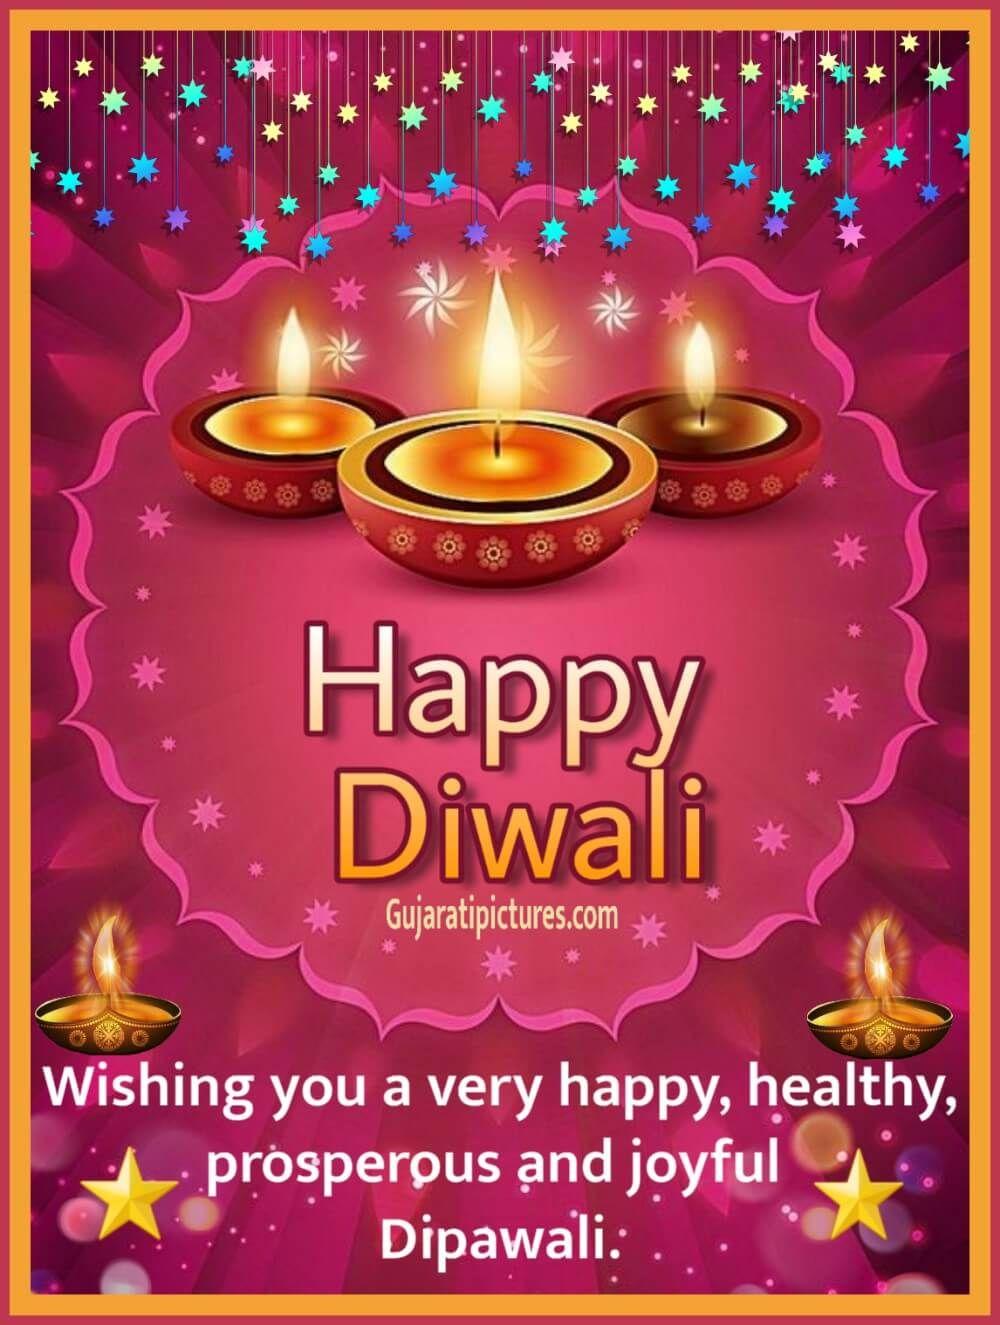 Pin on Happy Diwali 2020 Wishes